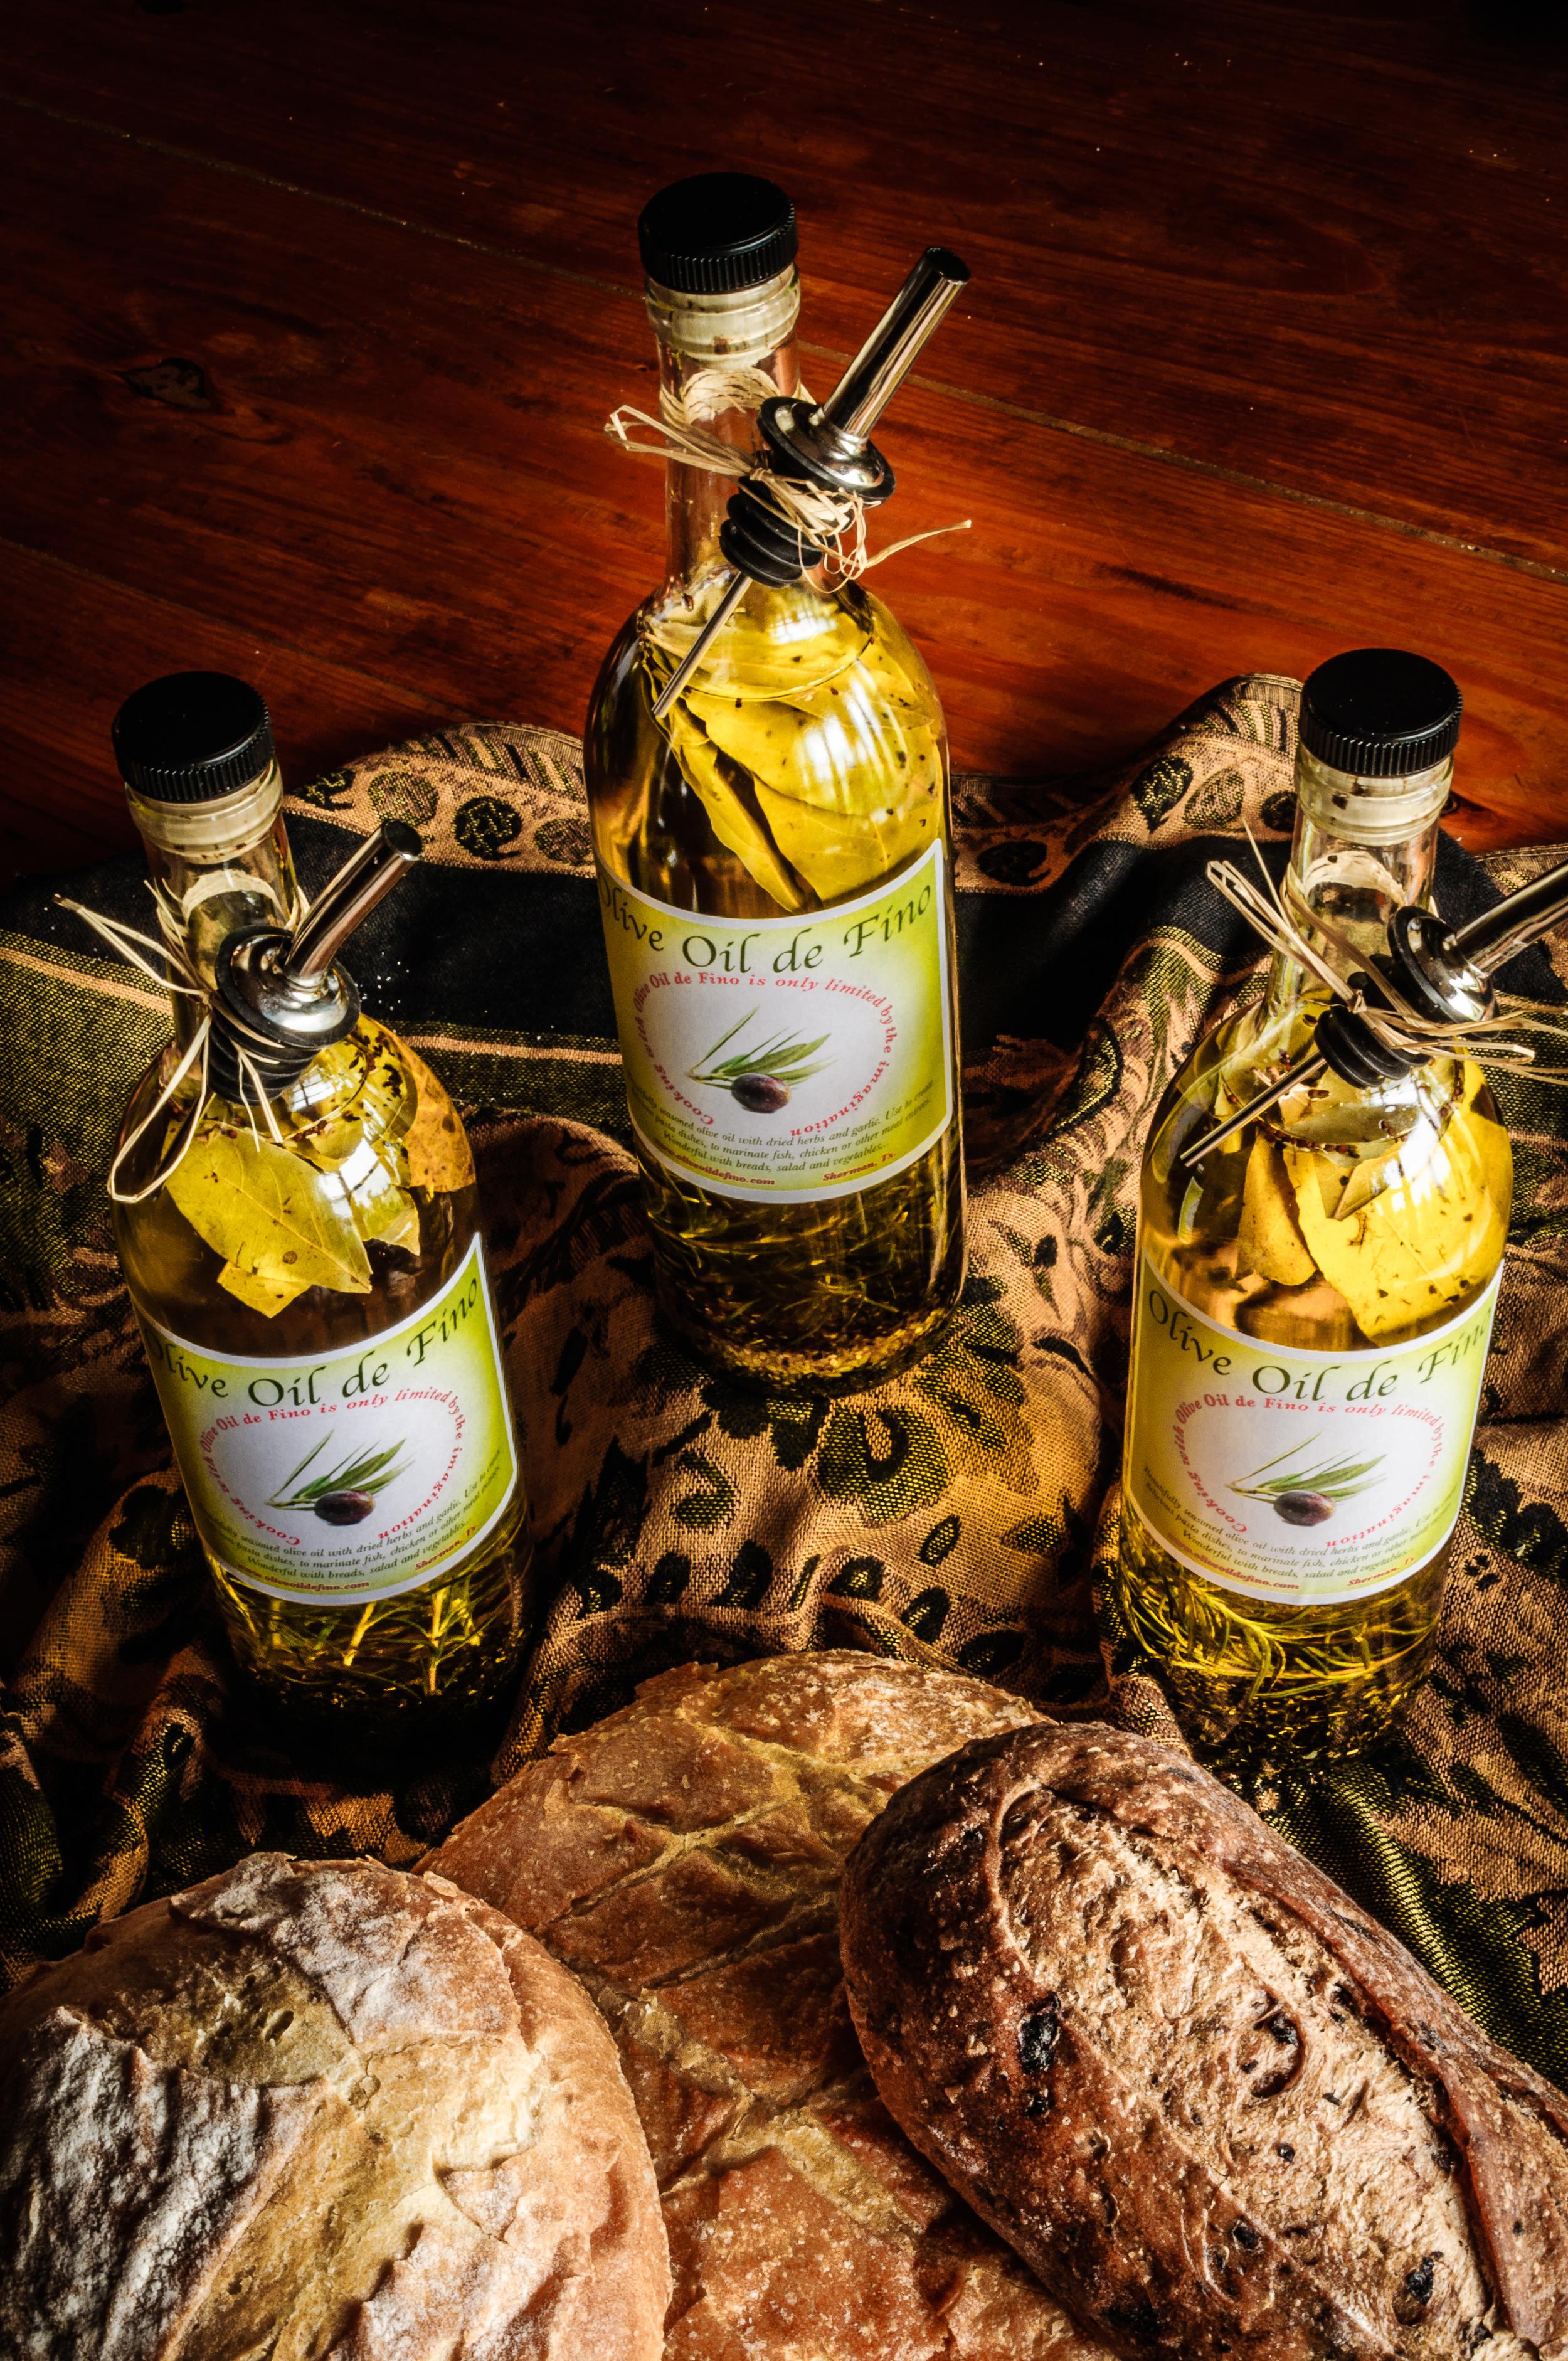 Olive Oil de Fino by Kathleen Hagan